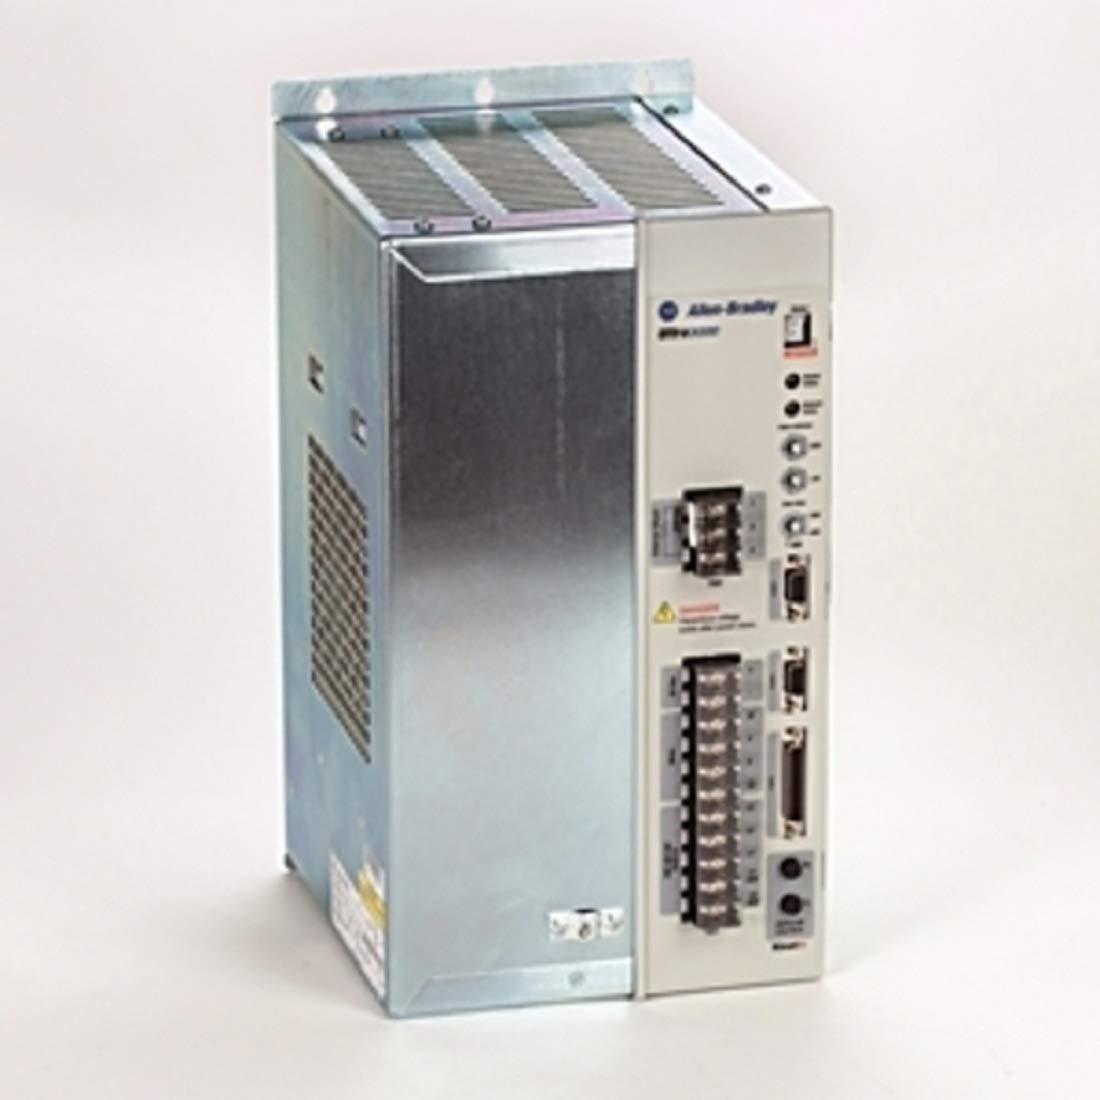 SERVO Drive,Amplifier 2098-DSD-HV220X Ser.B